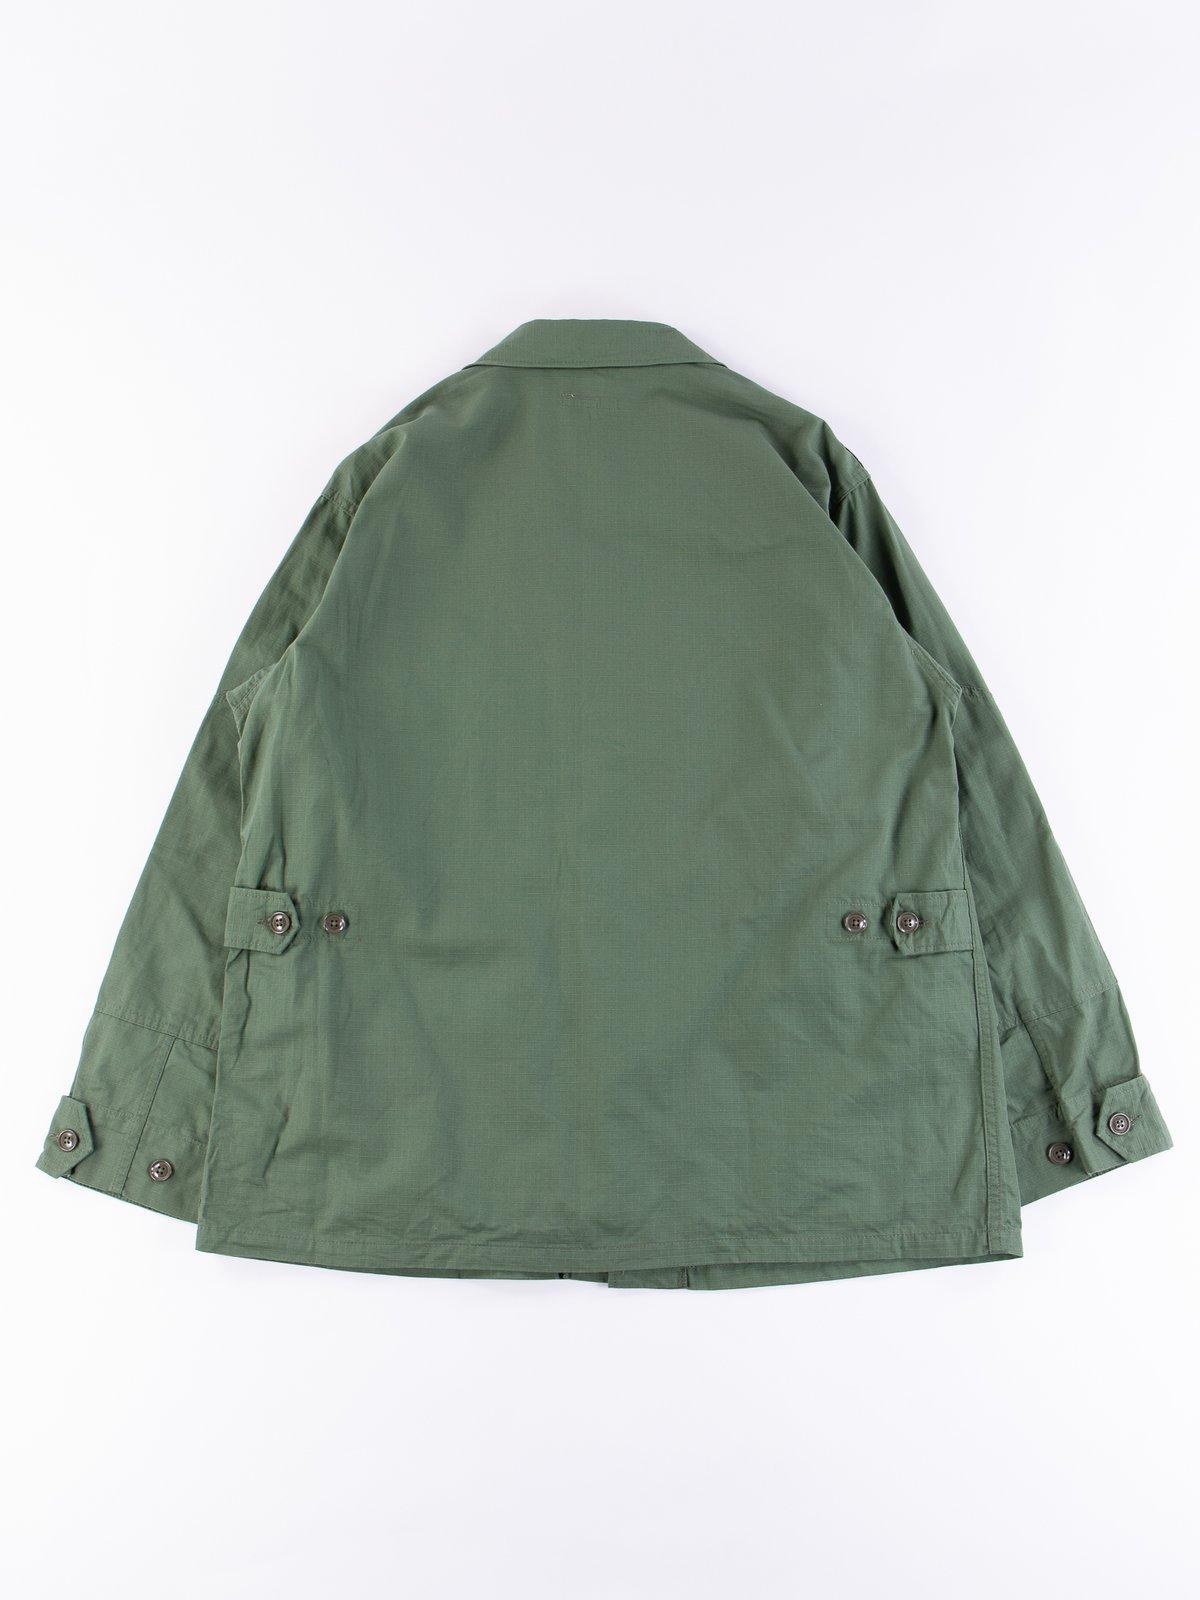 Olive Cotton Ripstop BDU Jacket - Image 5